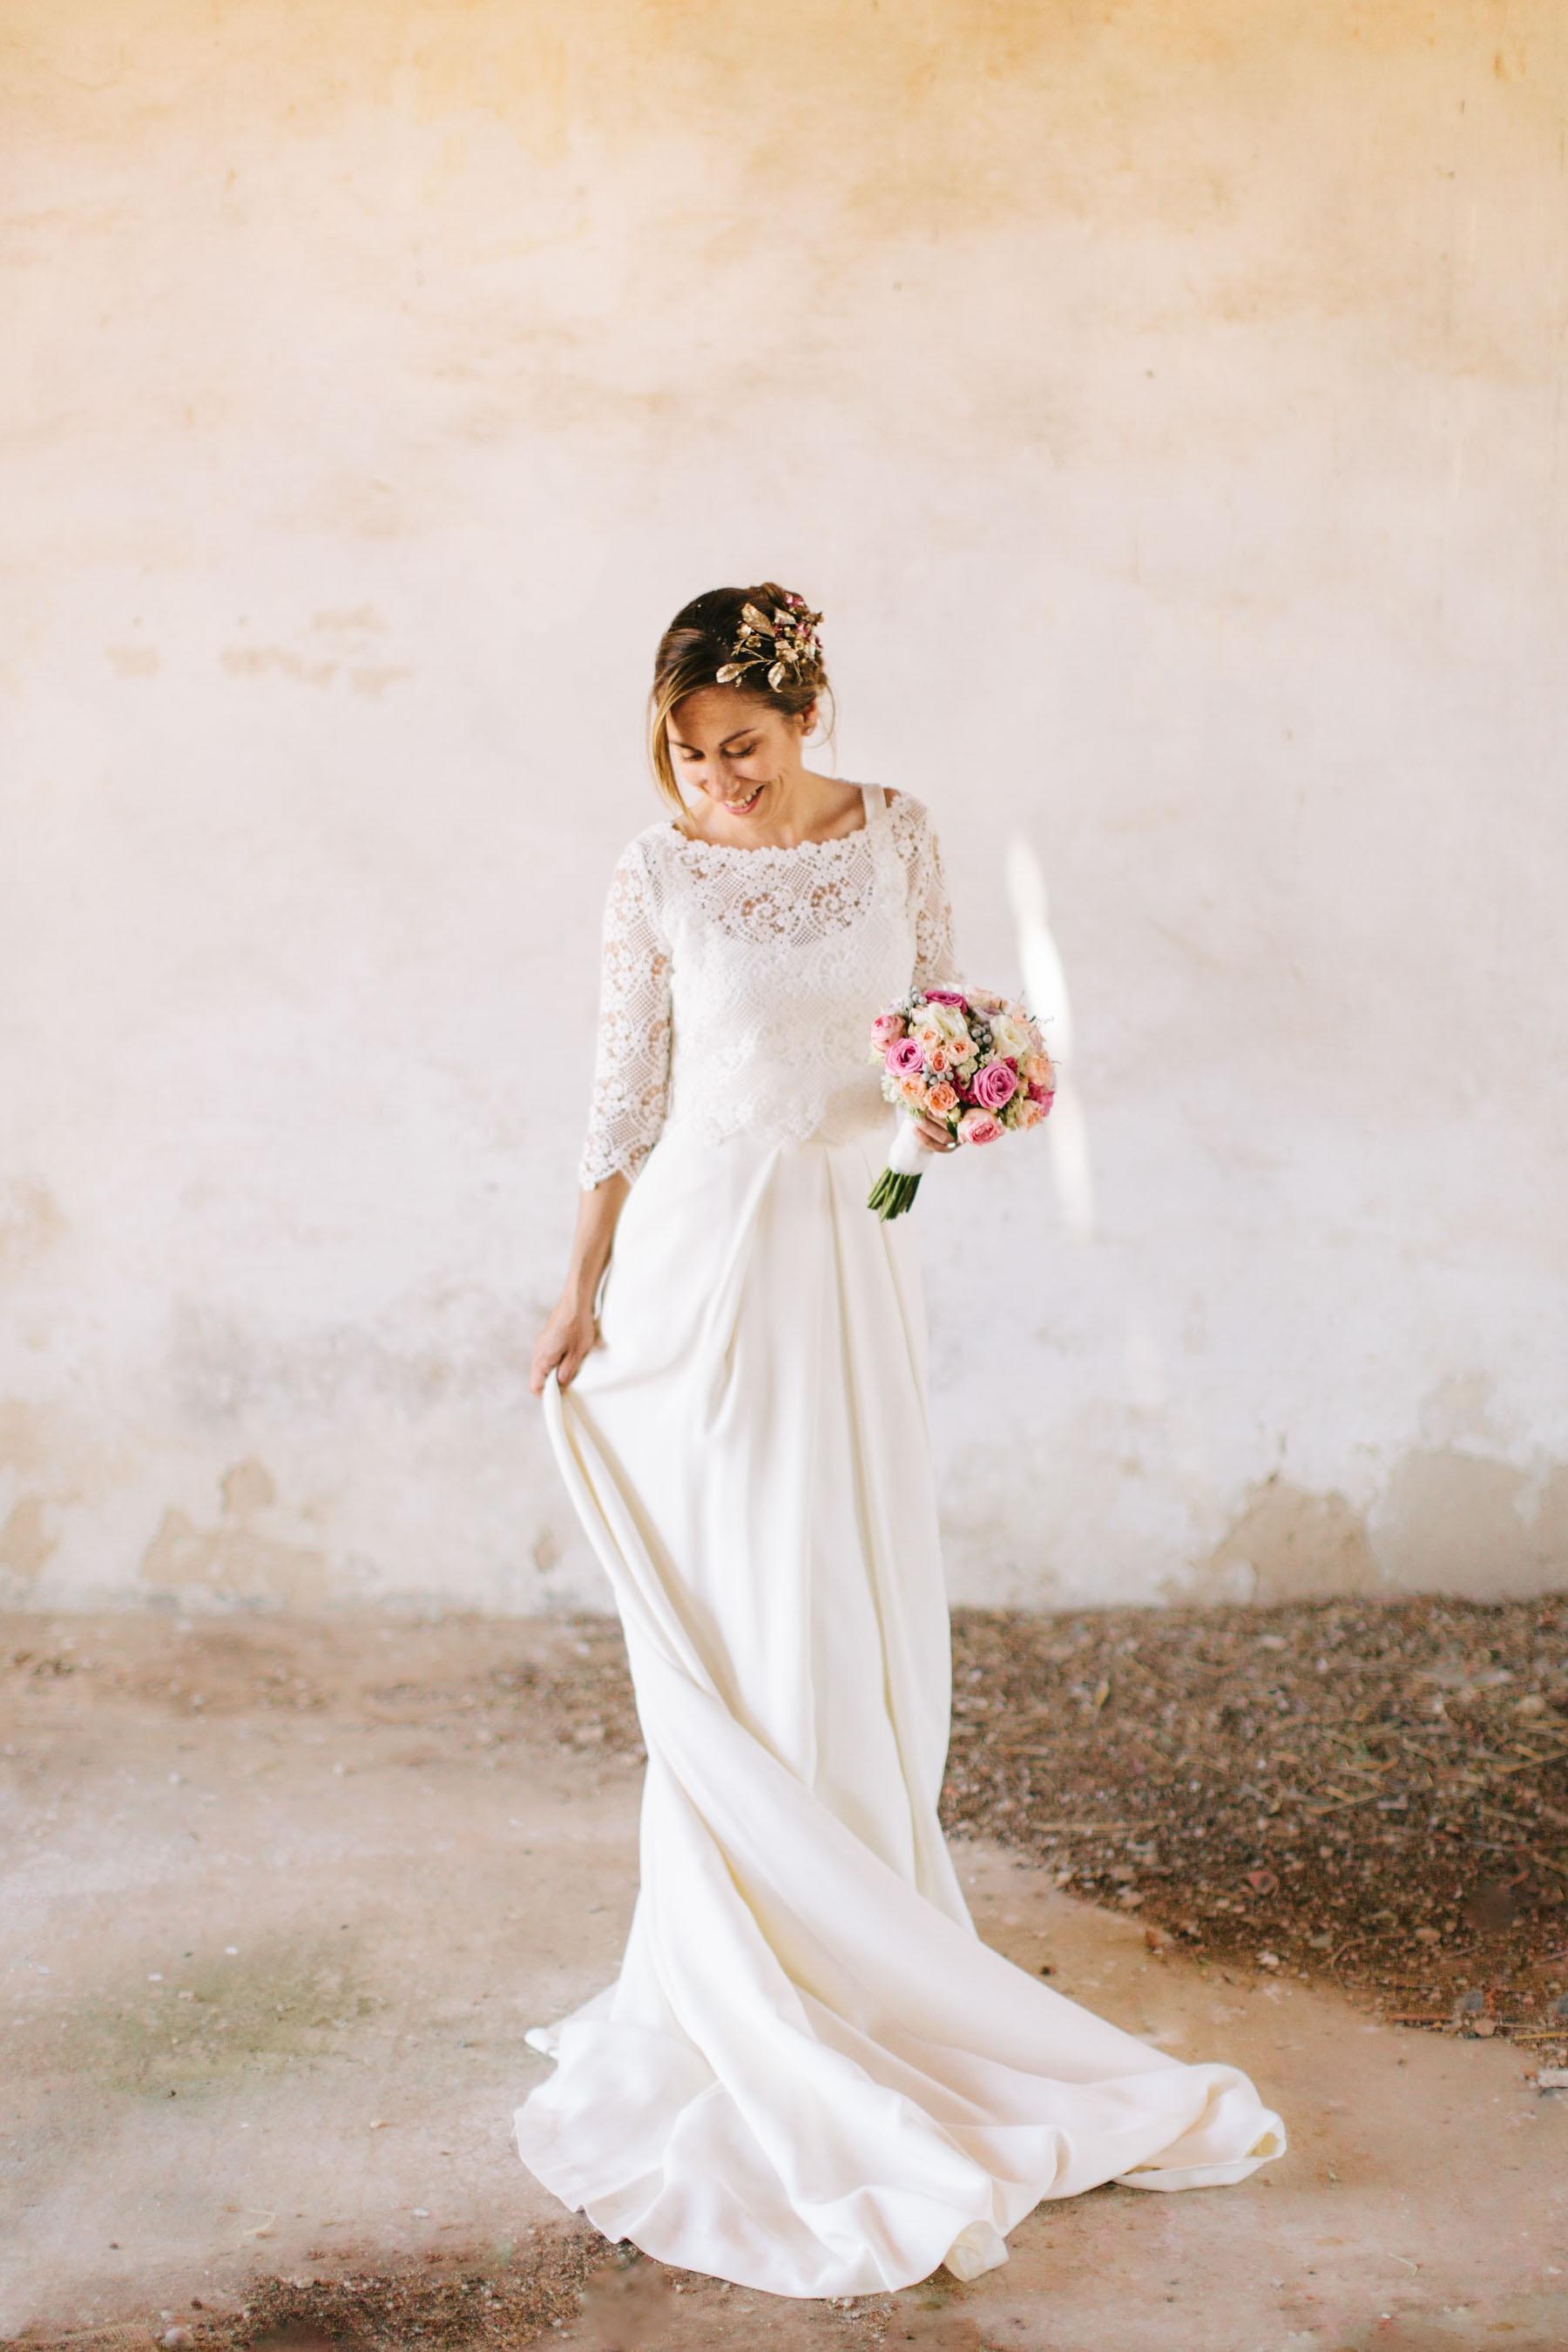 fotografo de bodas Jairo Crena-268